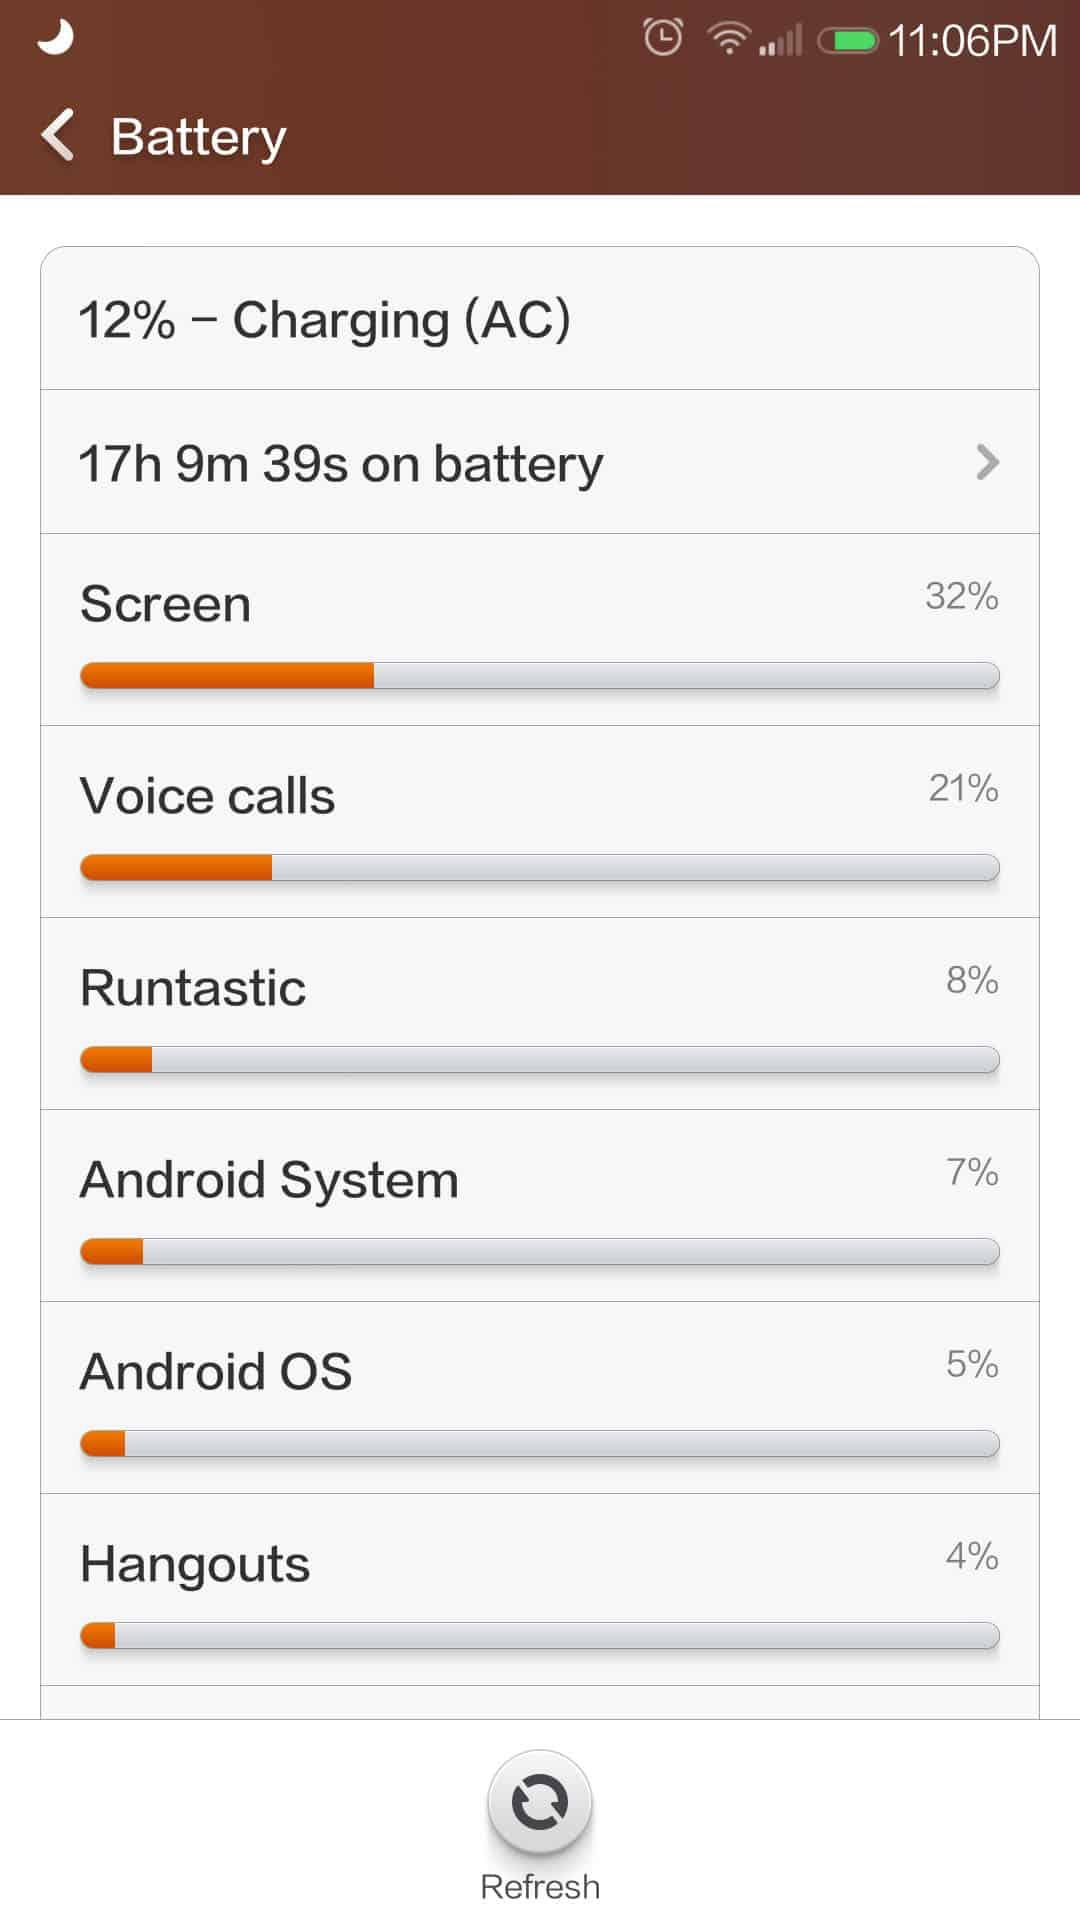 xiaomi mi4 miui5 battery day